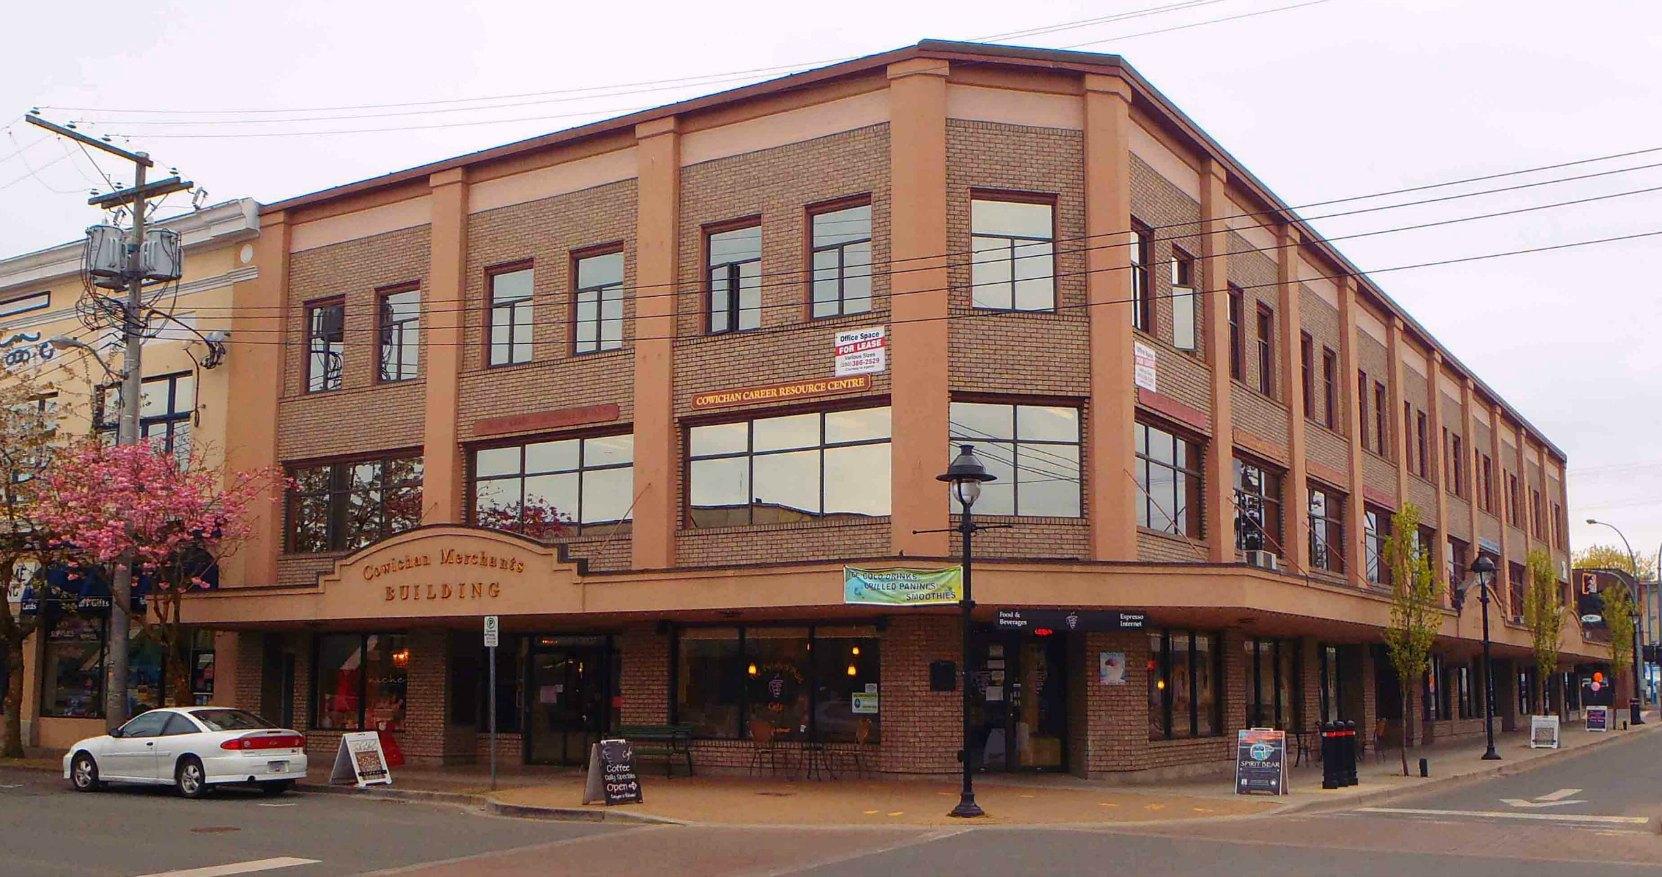 Cowichan Merchants Building, Craig Street and Station Street, Duncan, B.C.